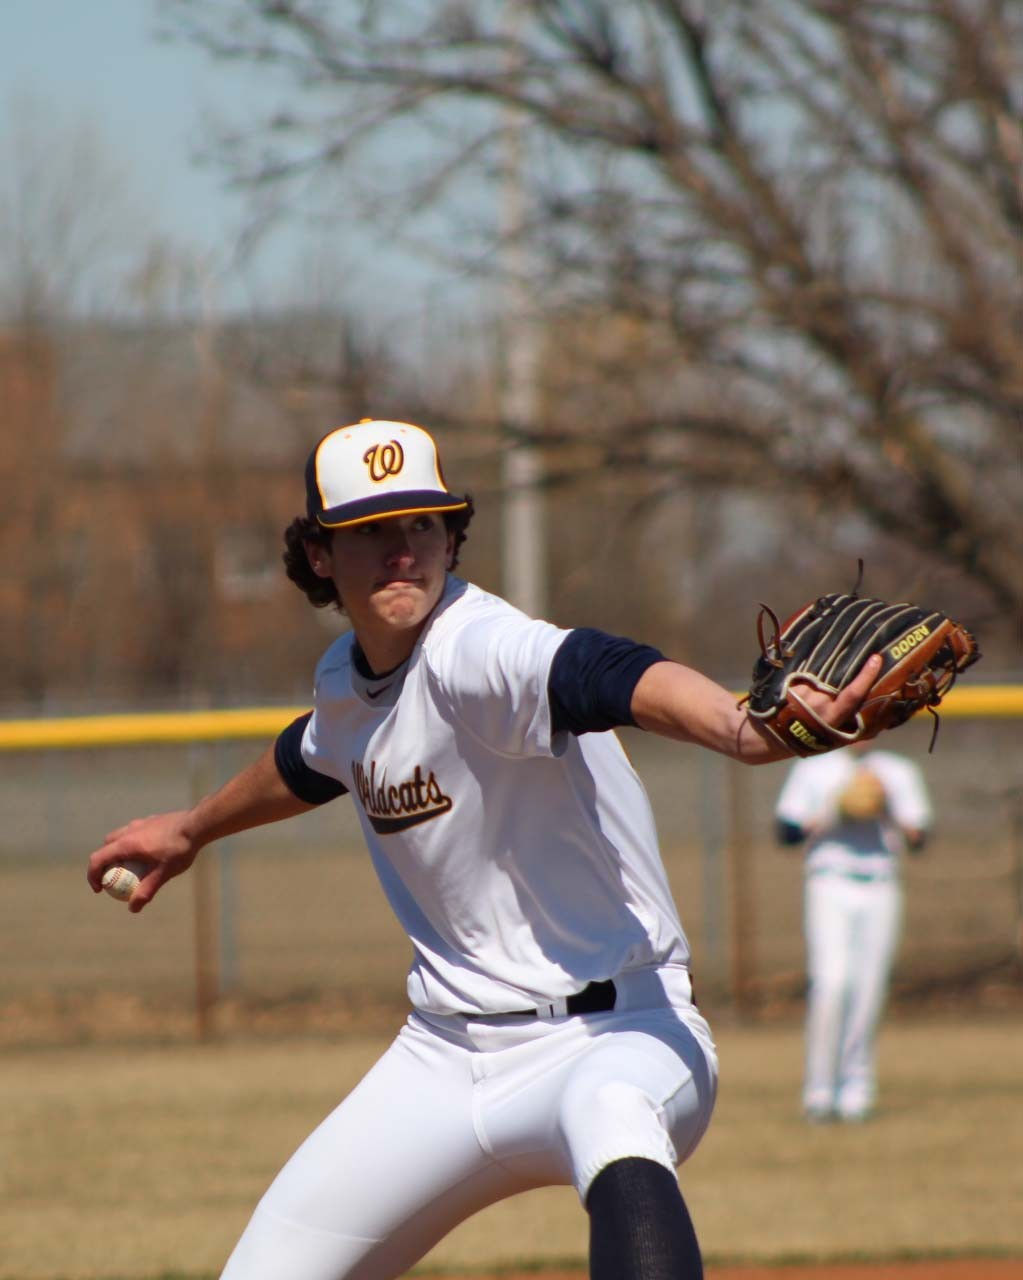 Woodmore 6-foot-4, 200-pound senior pitcher Hunter Allen.  (Photo by Joe Belak)